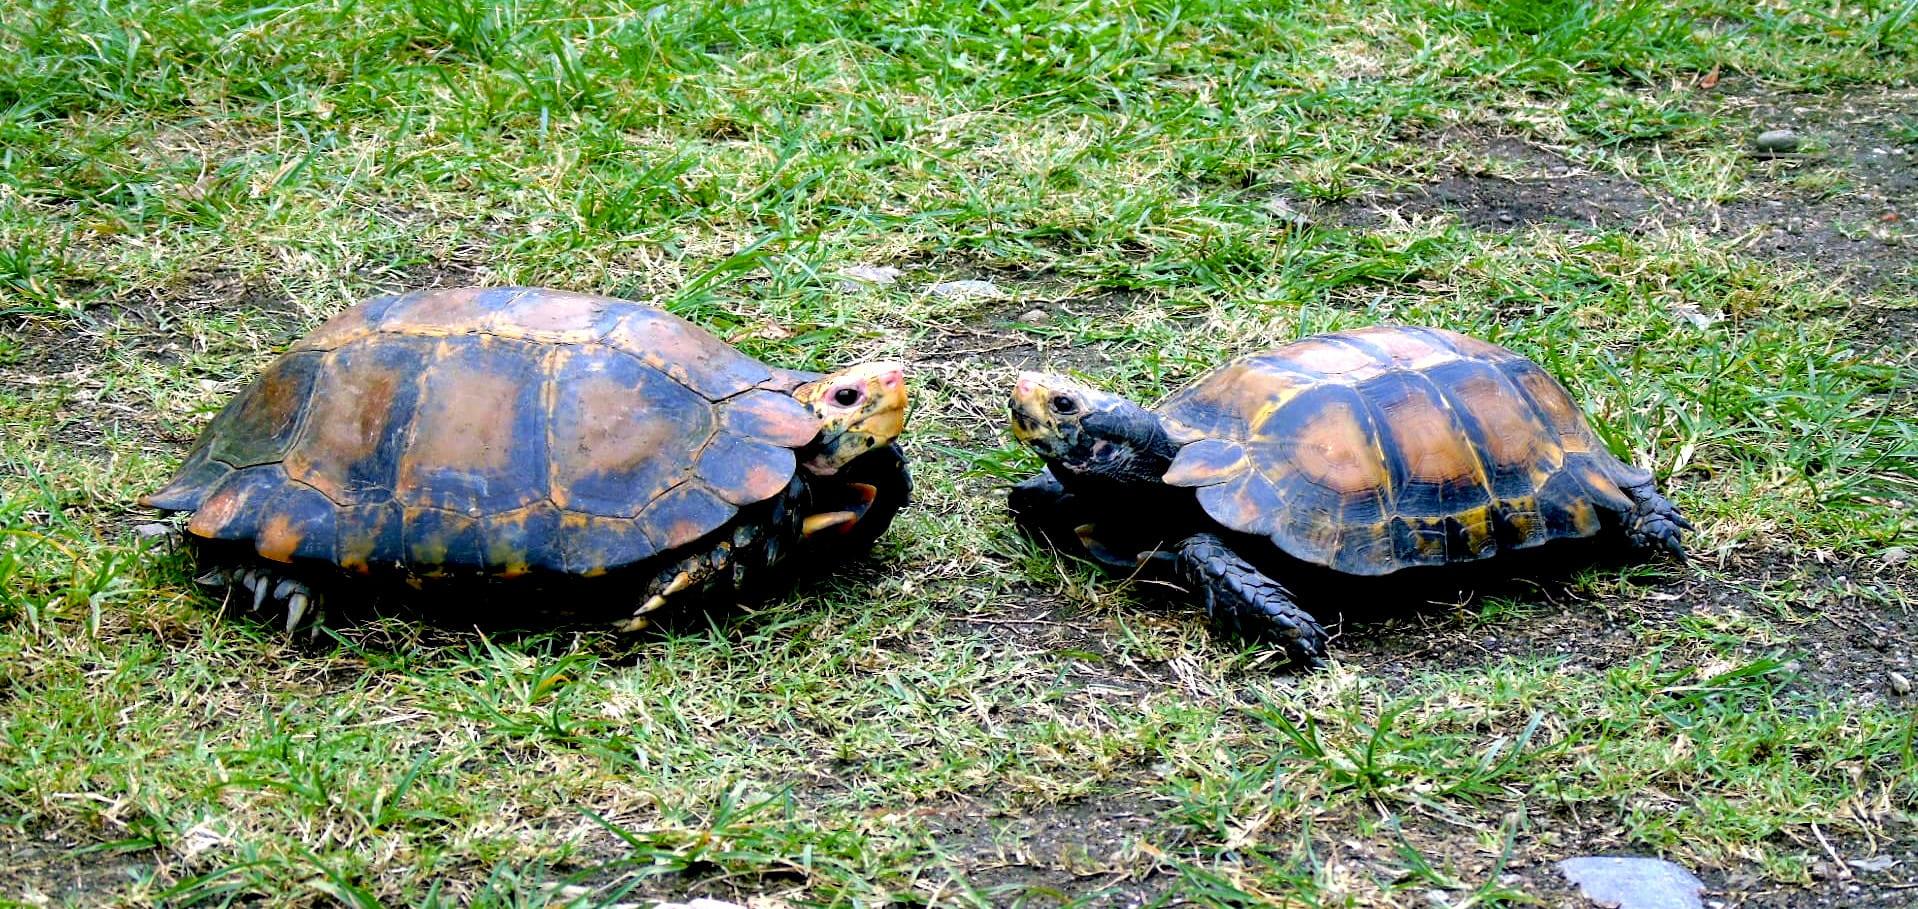 arunachal-pradesh-impressed-tortoise-female-on-left-and-male-right